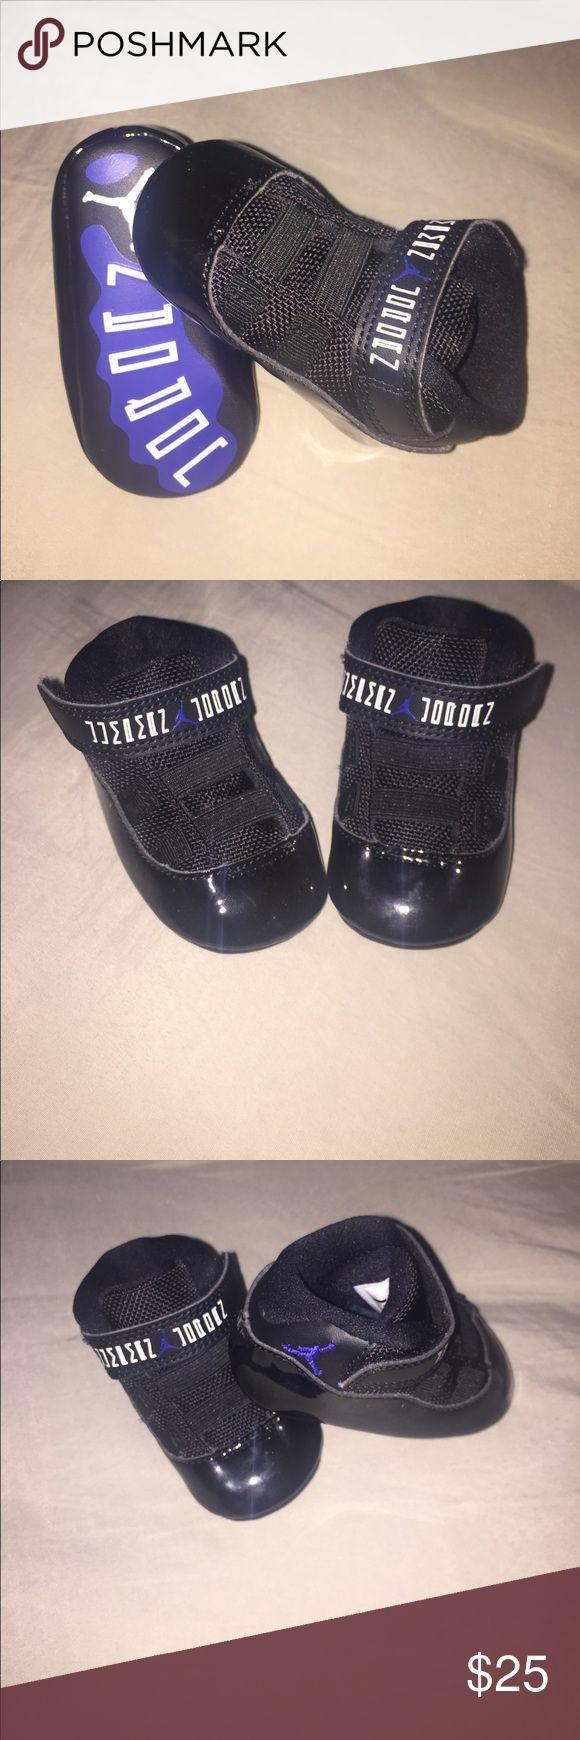 Baby Jordan Space Jams! Black and blue, size 2 Jordan space jams! Super cute with jeans! Jordan Shoes Sneakers